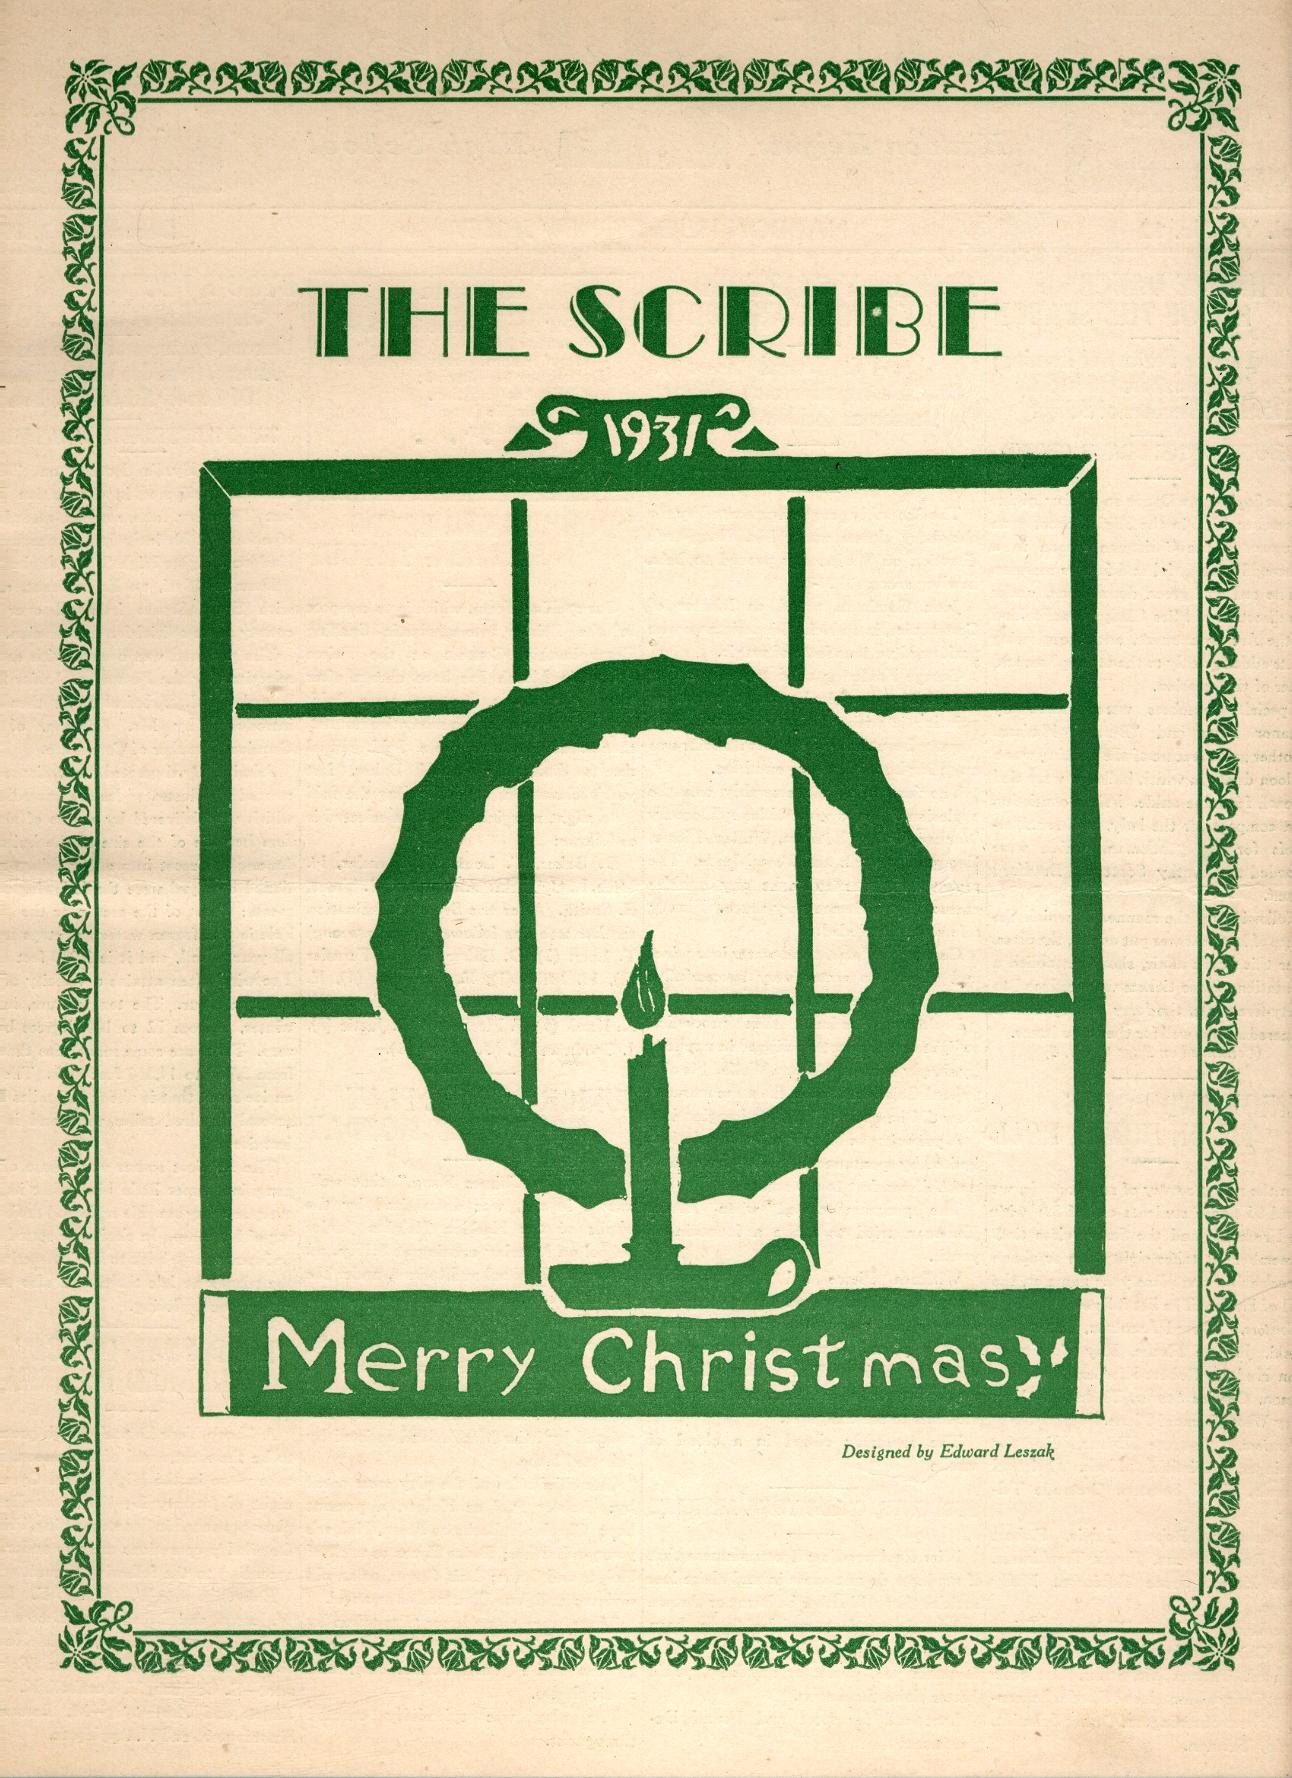 scribe-193112